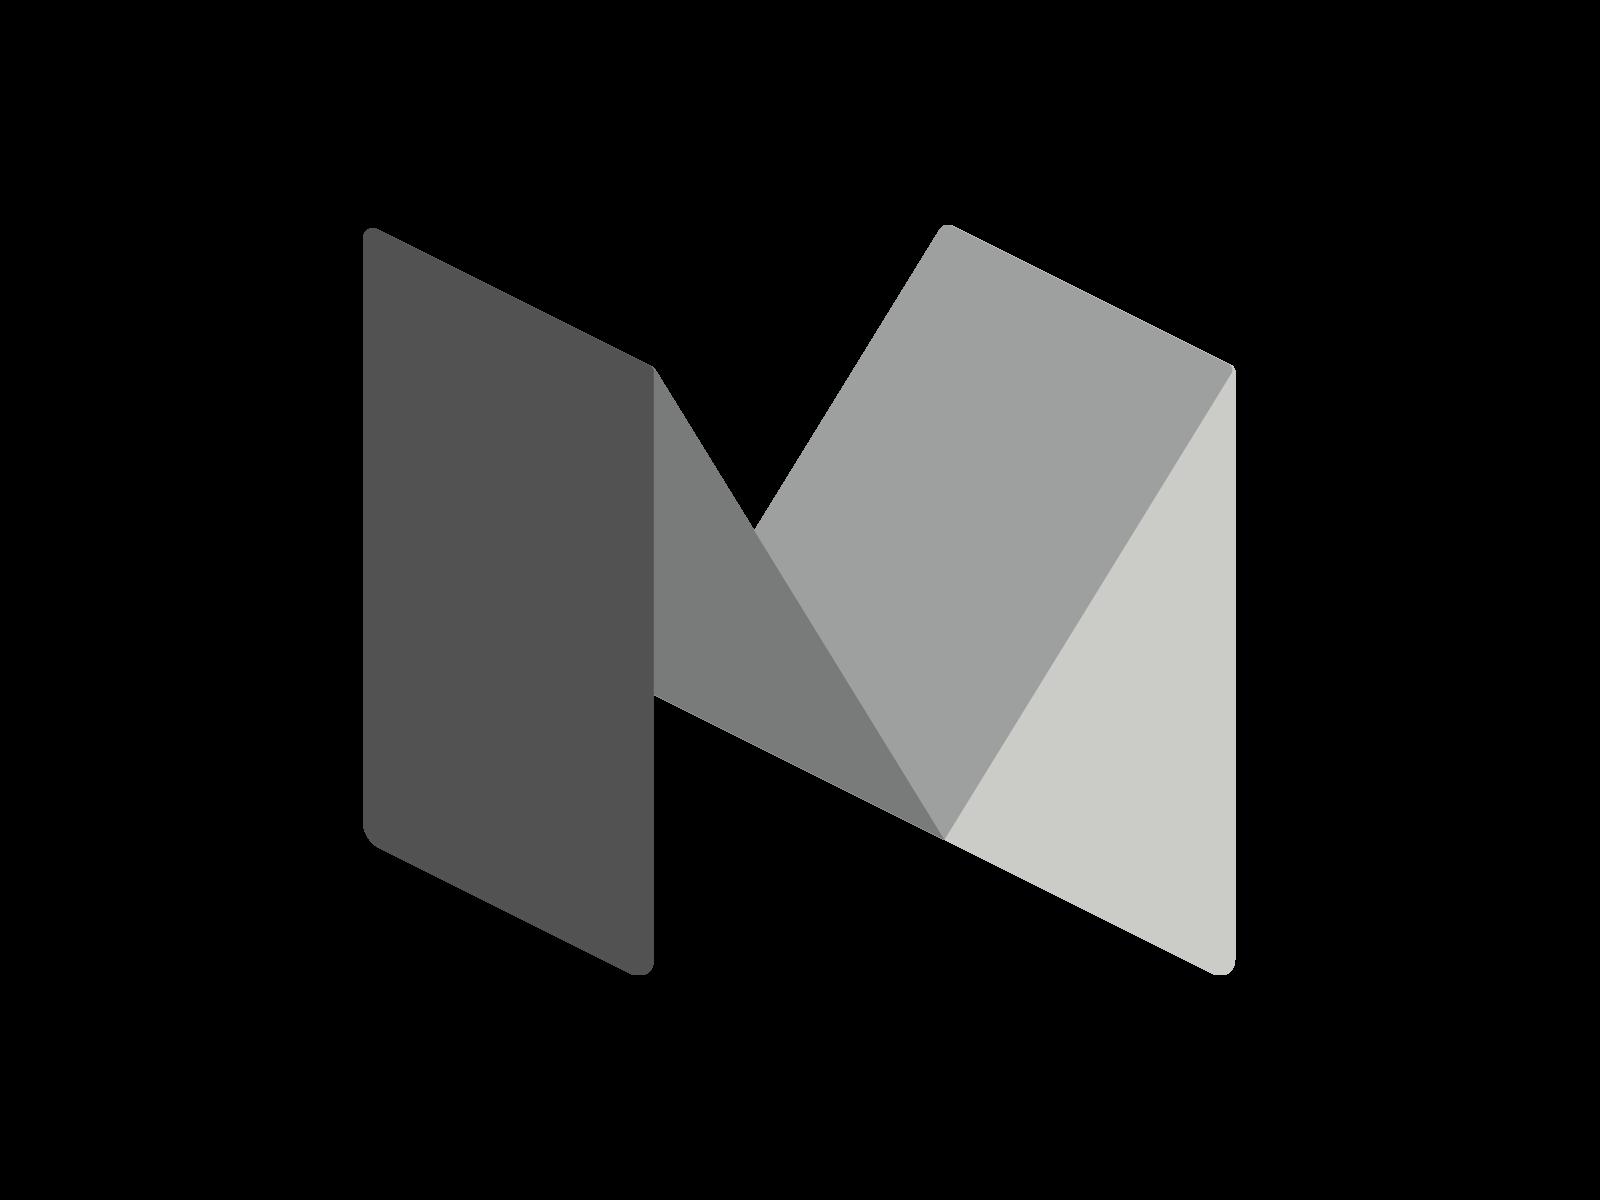 Medium Logo Transparent - Medium, Transparent background PNG HD thumbnail